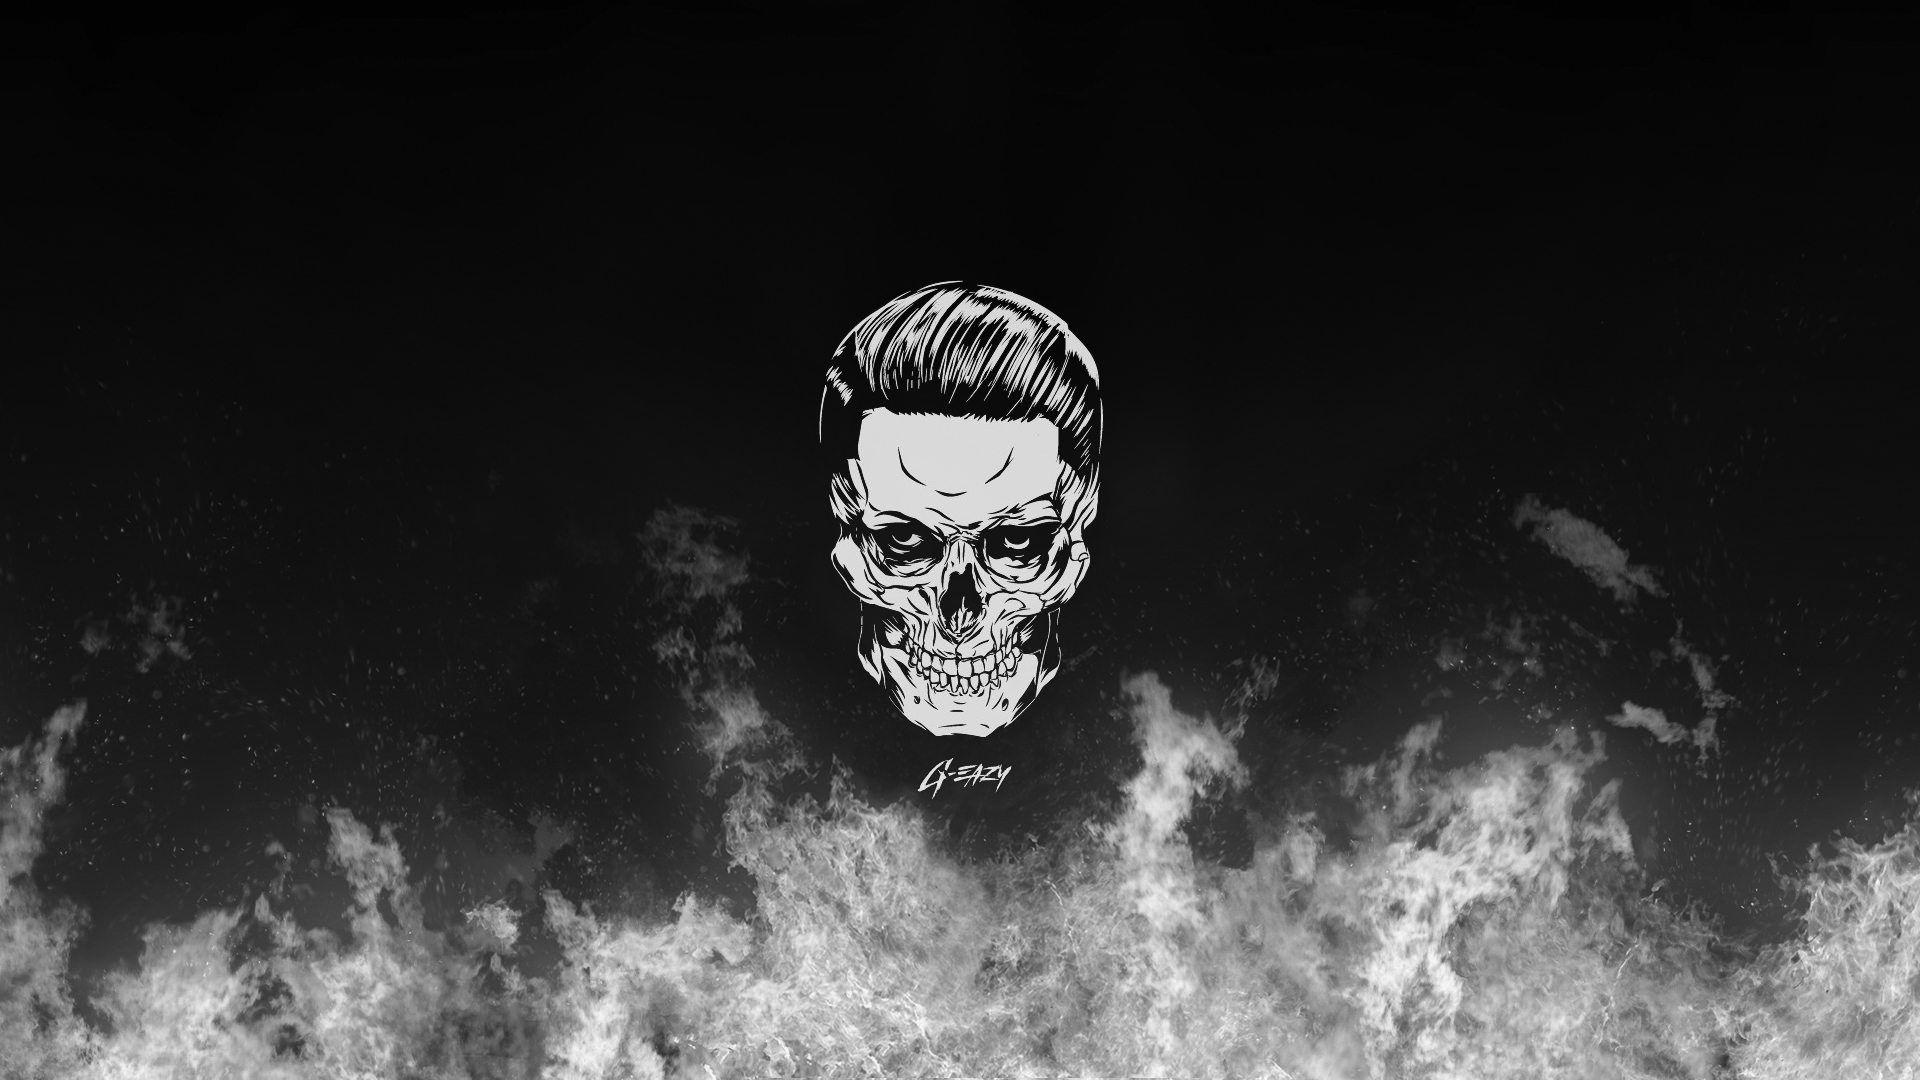 g-eazy skull hd wallpaper from gallsource | g eazy | pinterest